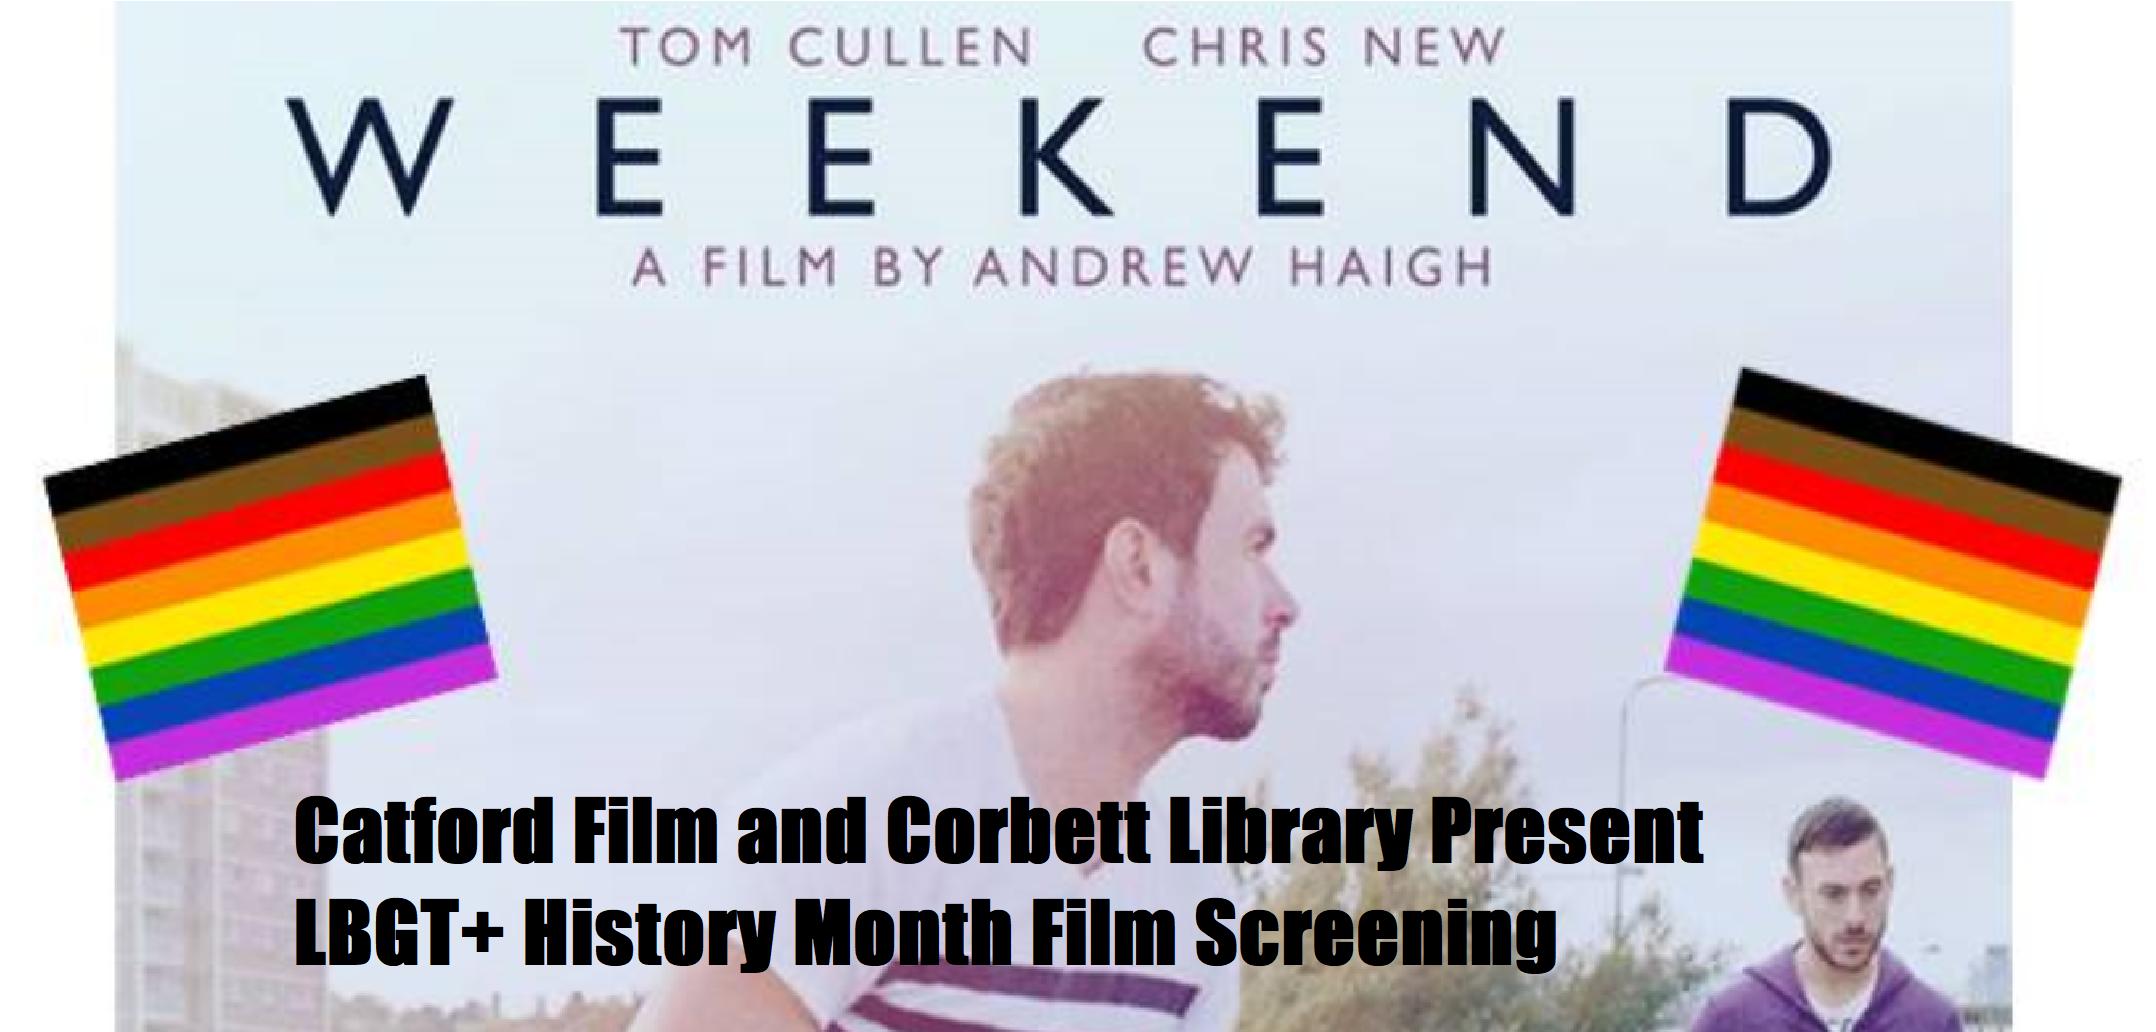 Catford Film Screening – Friday 21 February 2020